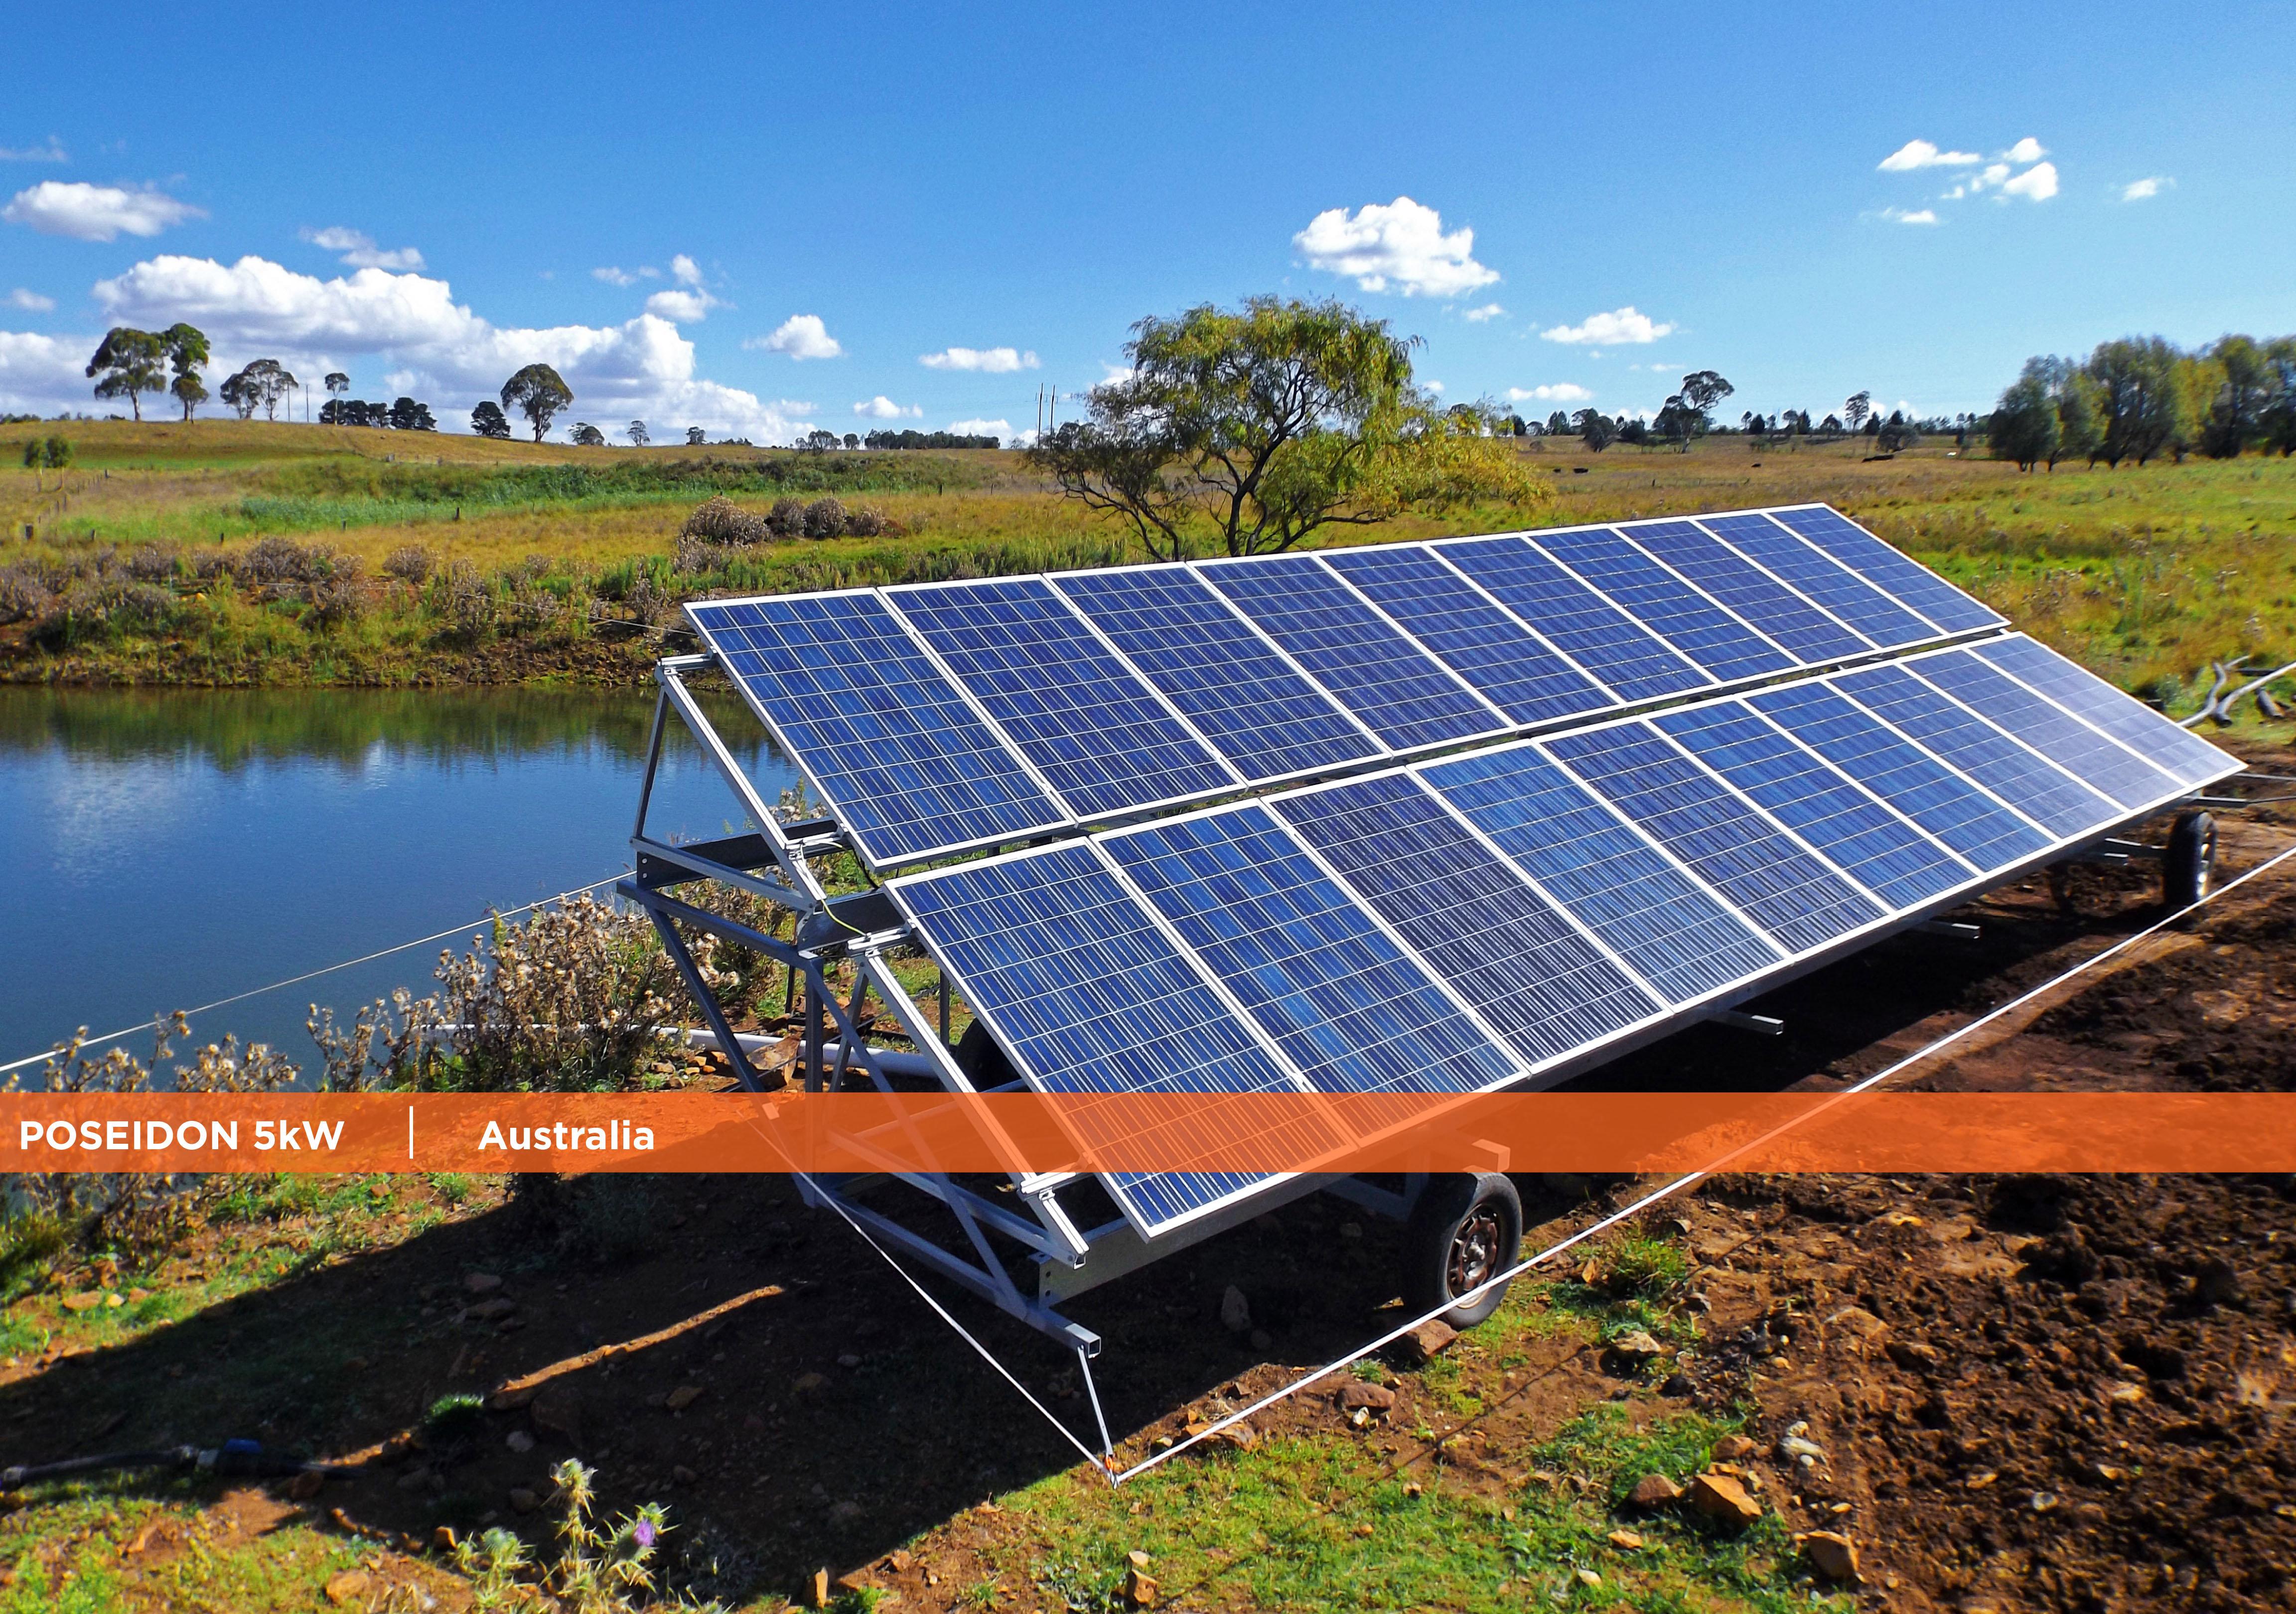 Symtech Solar - Newsletter October 2016-Poseidon 5kW Australia